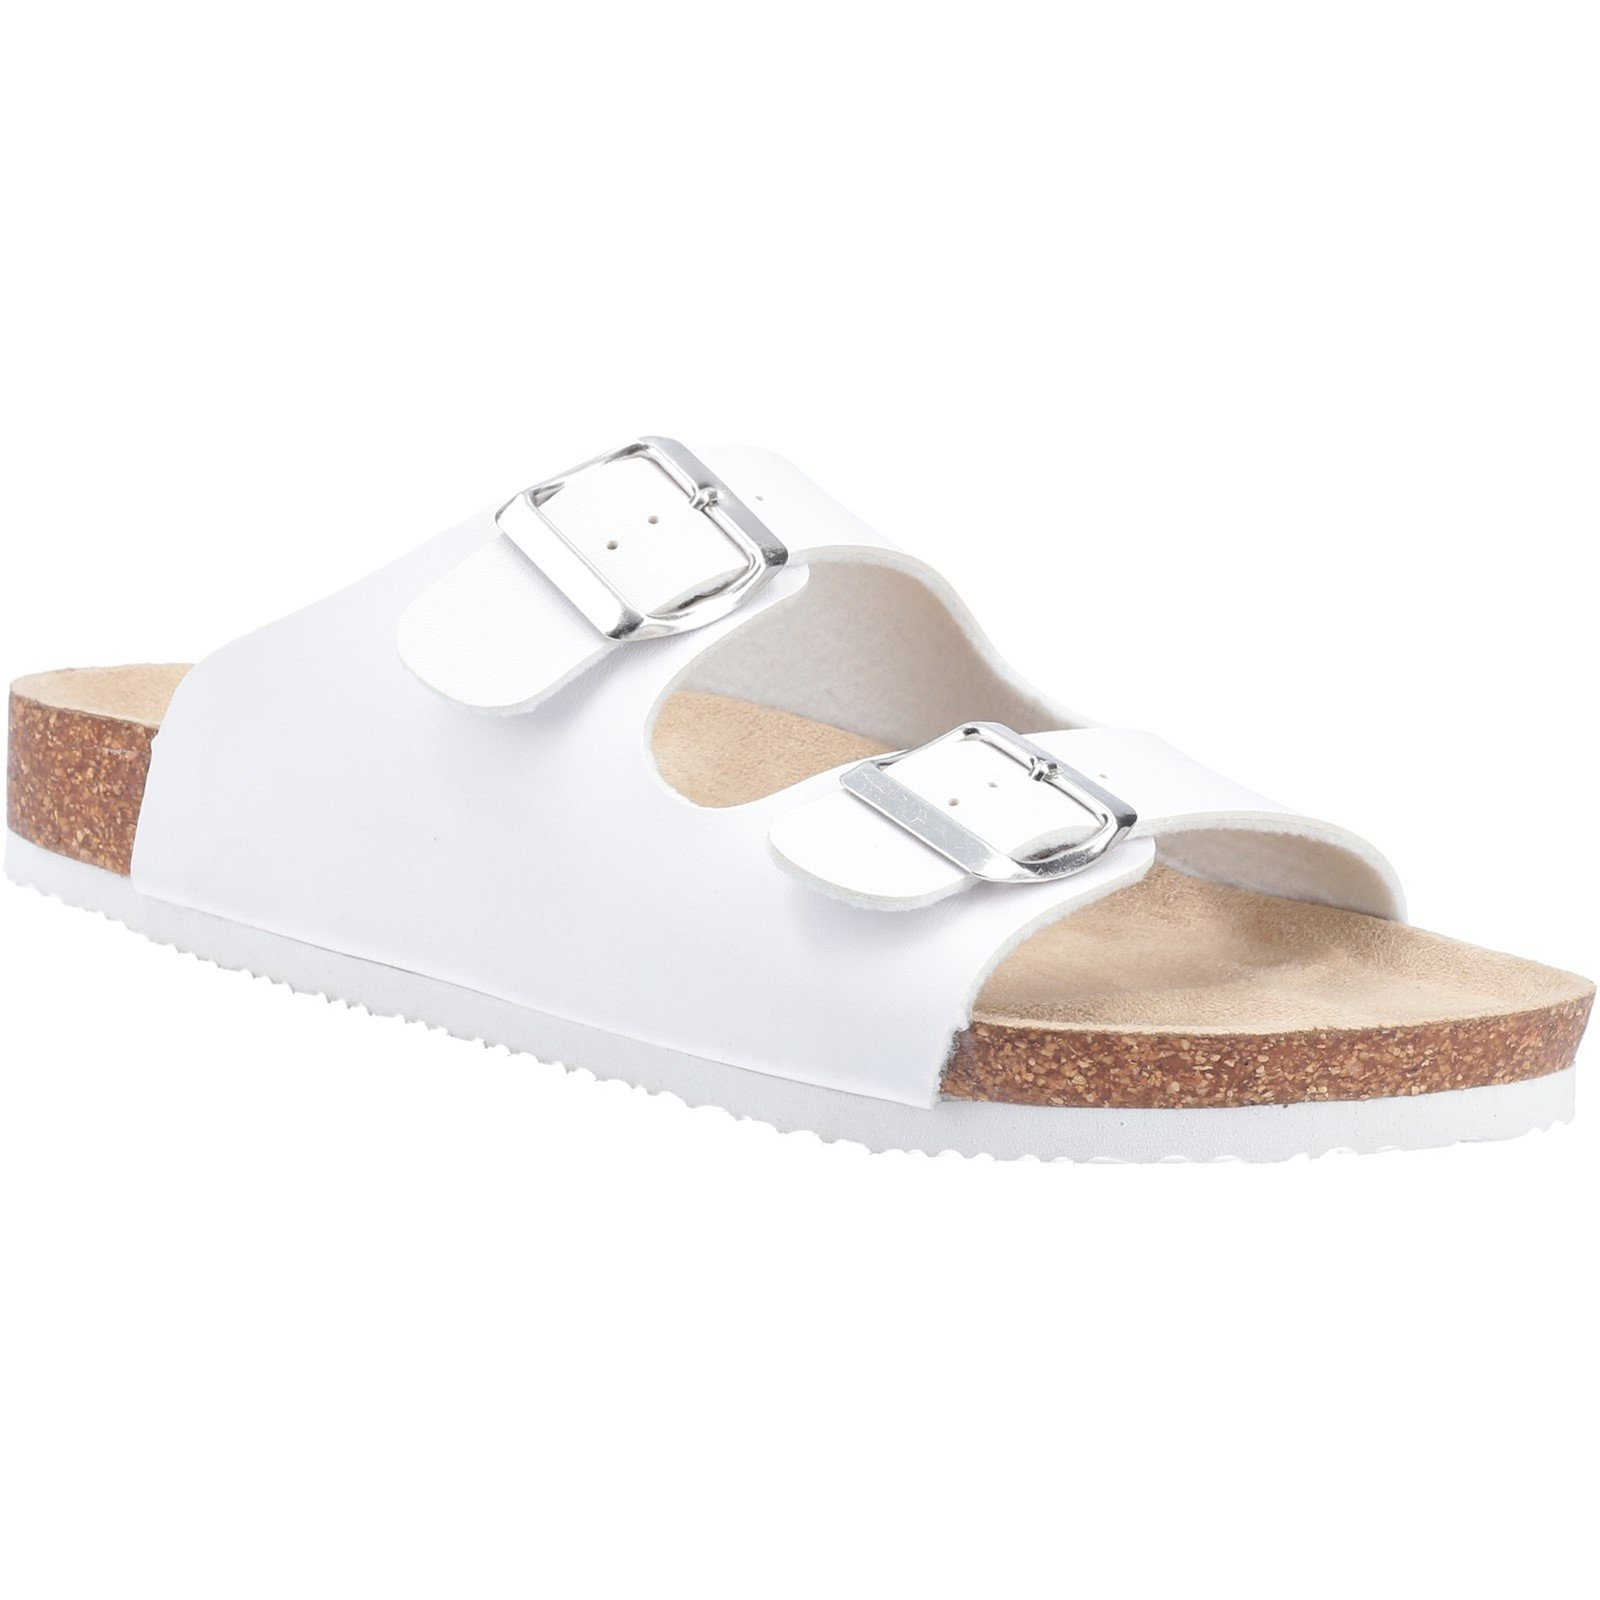 Divaz Women's Nimes Two Buckle Sandal Various Colours 31920 - White 3